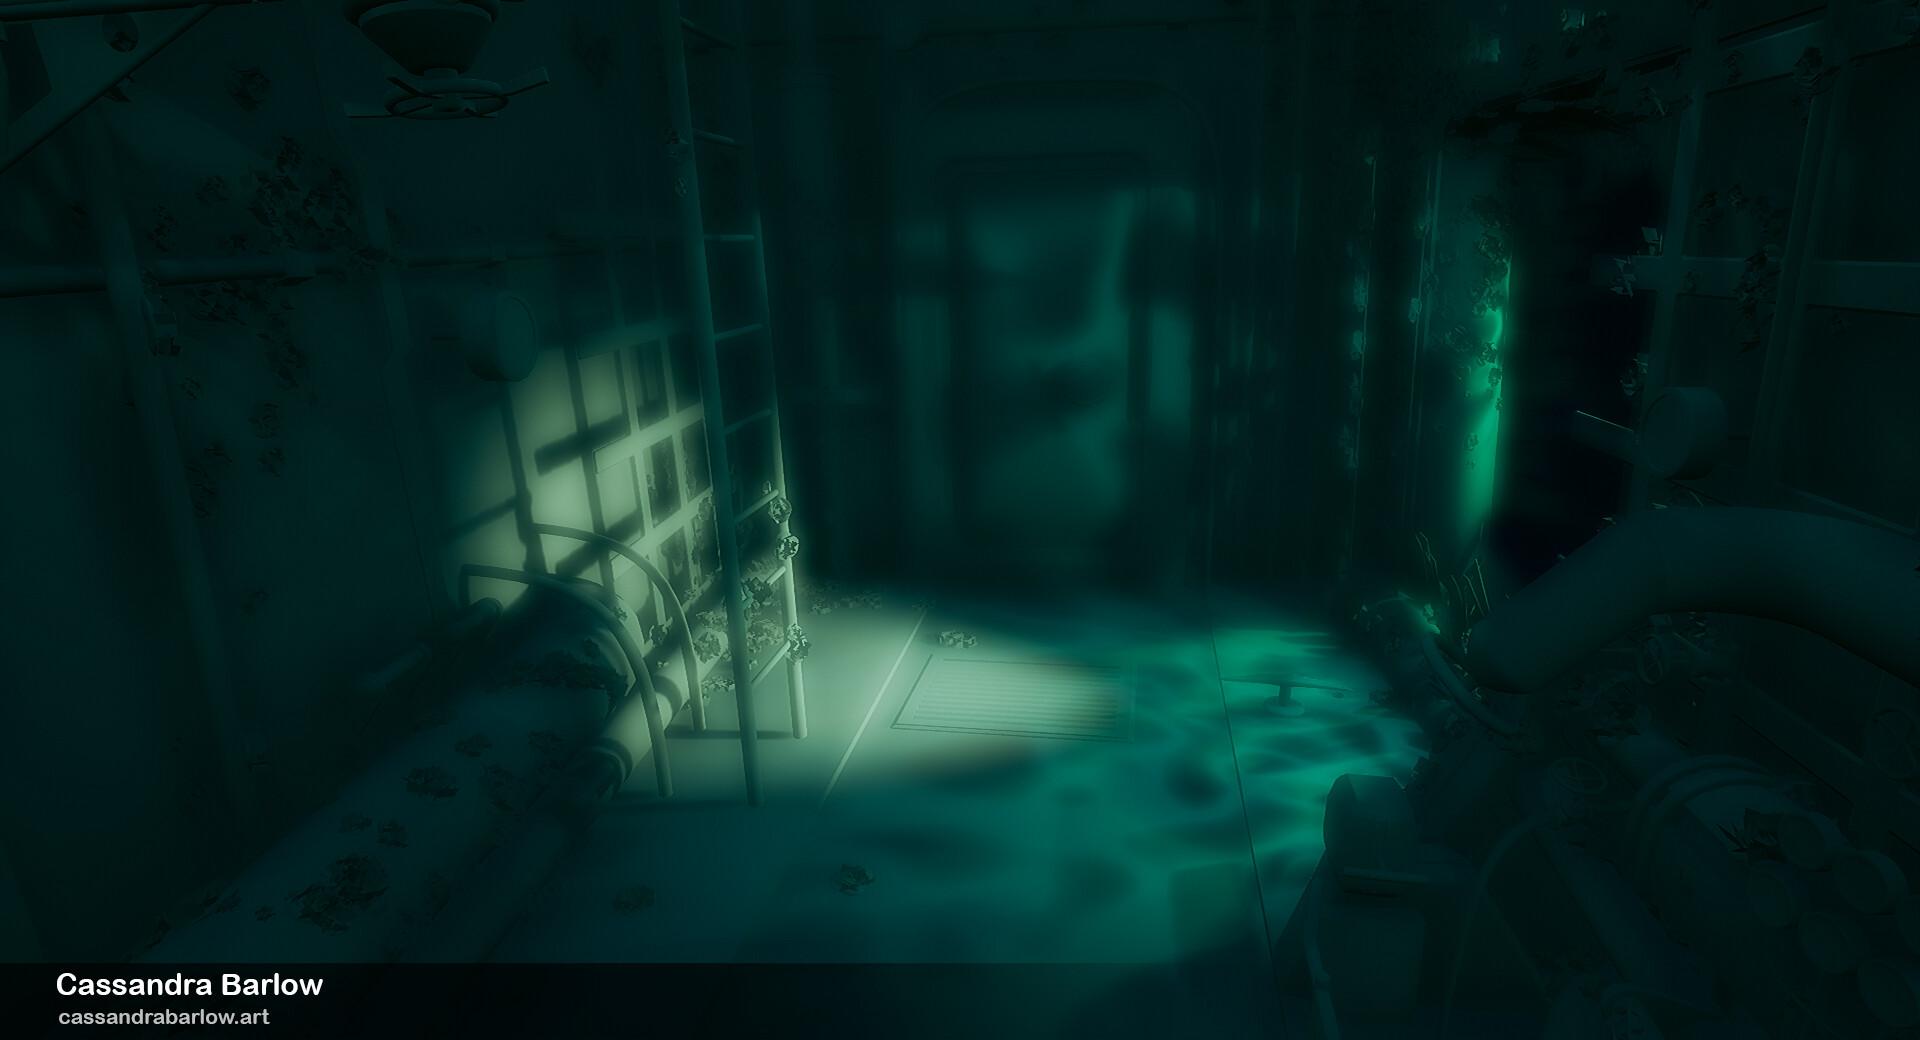 Cassandra barlow cassandrabarlow submarinewreckjustlighting